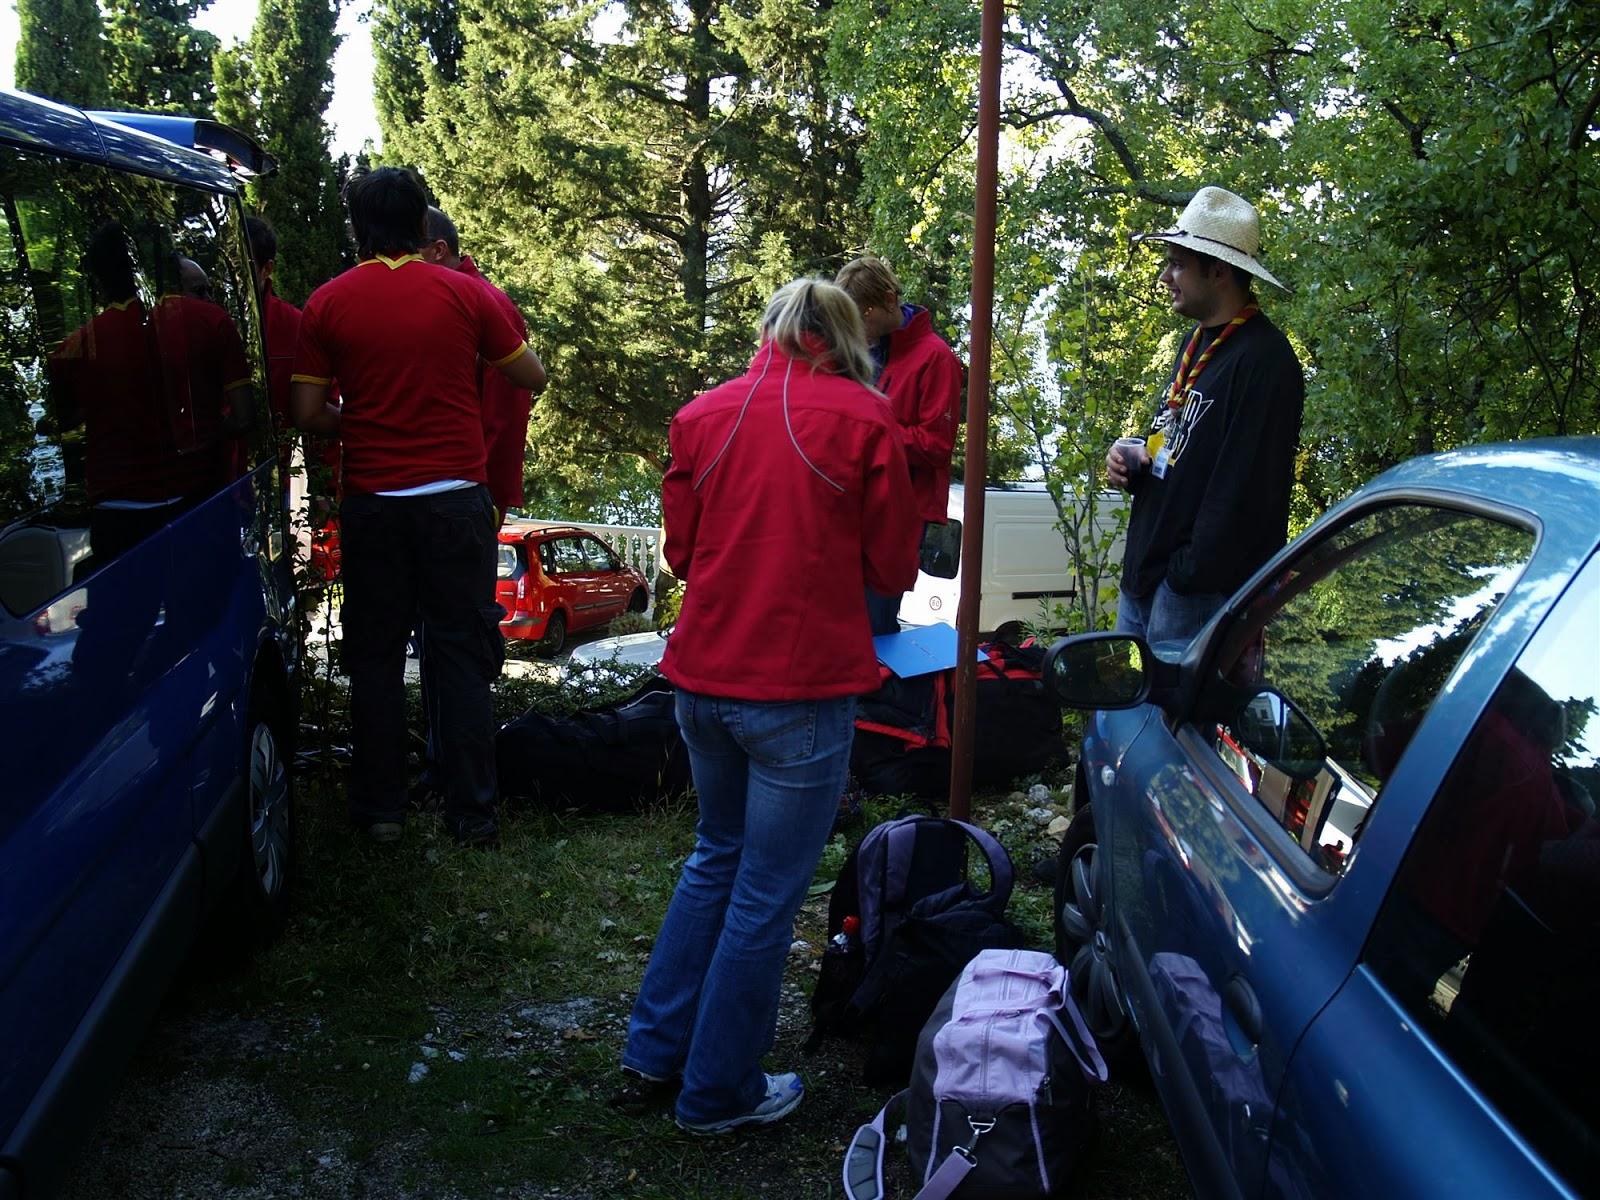 Gastro rally, Selce 2009 - _A254857.JPG